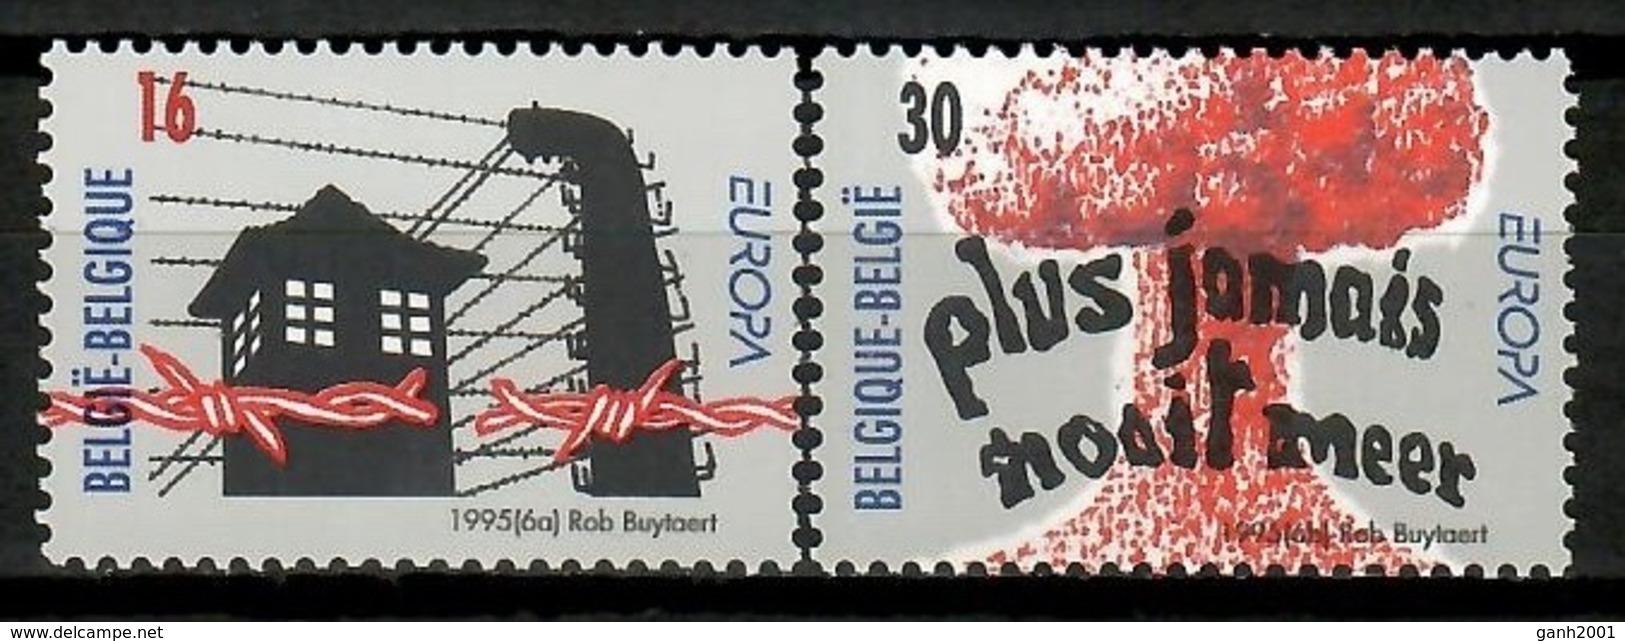 Belgium 1995 Bélgica / Europa CEPT Peace & Freedom MNH Paz Y Libertad / Kj26  30-28 - Europa-CEPT